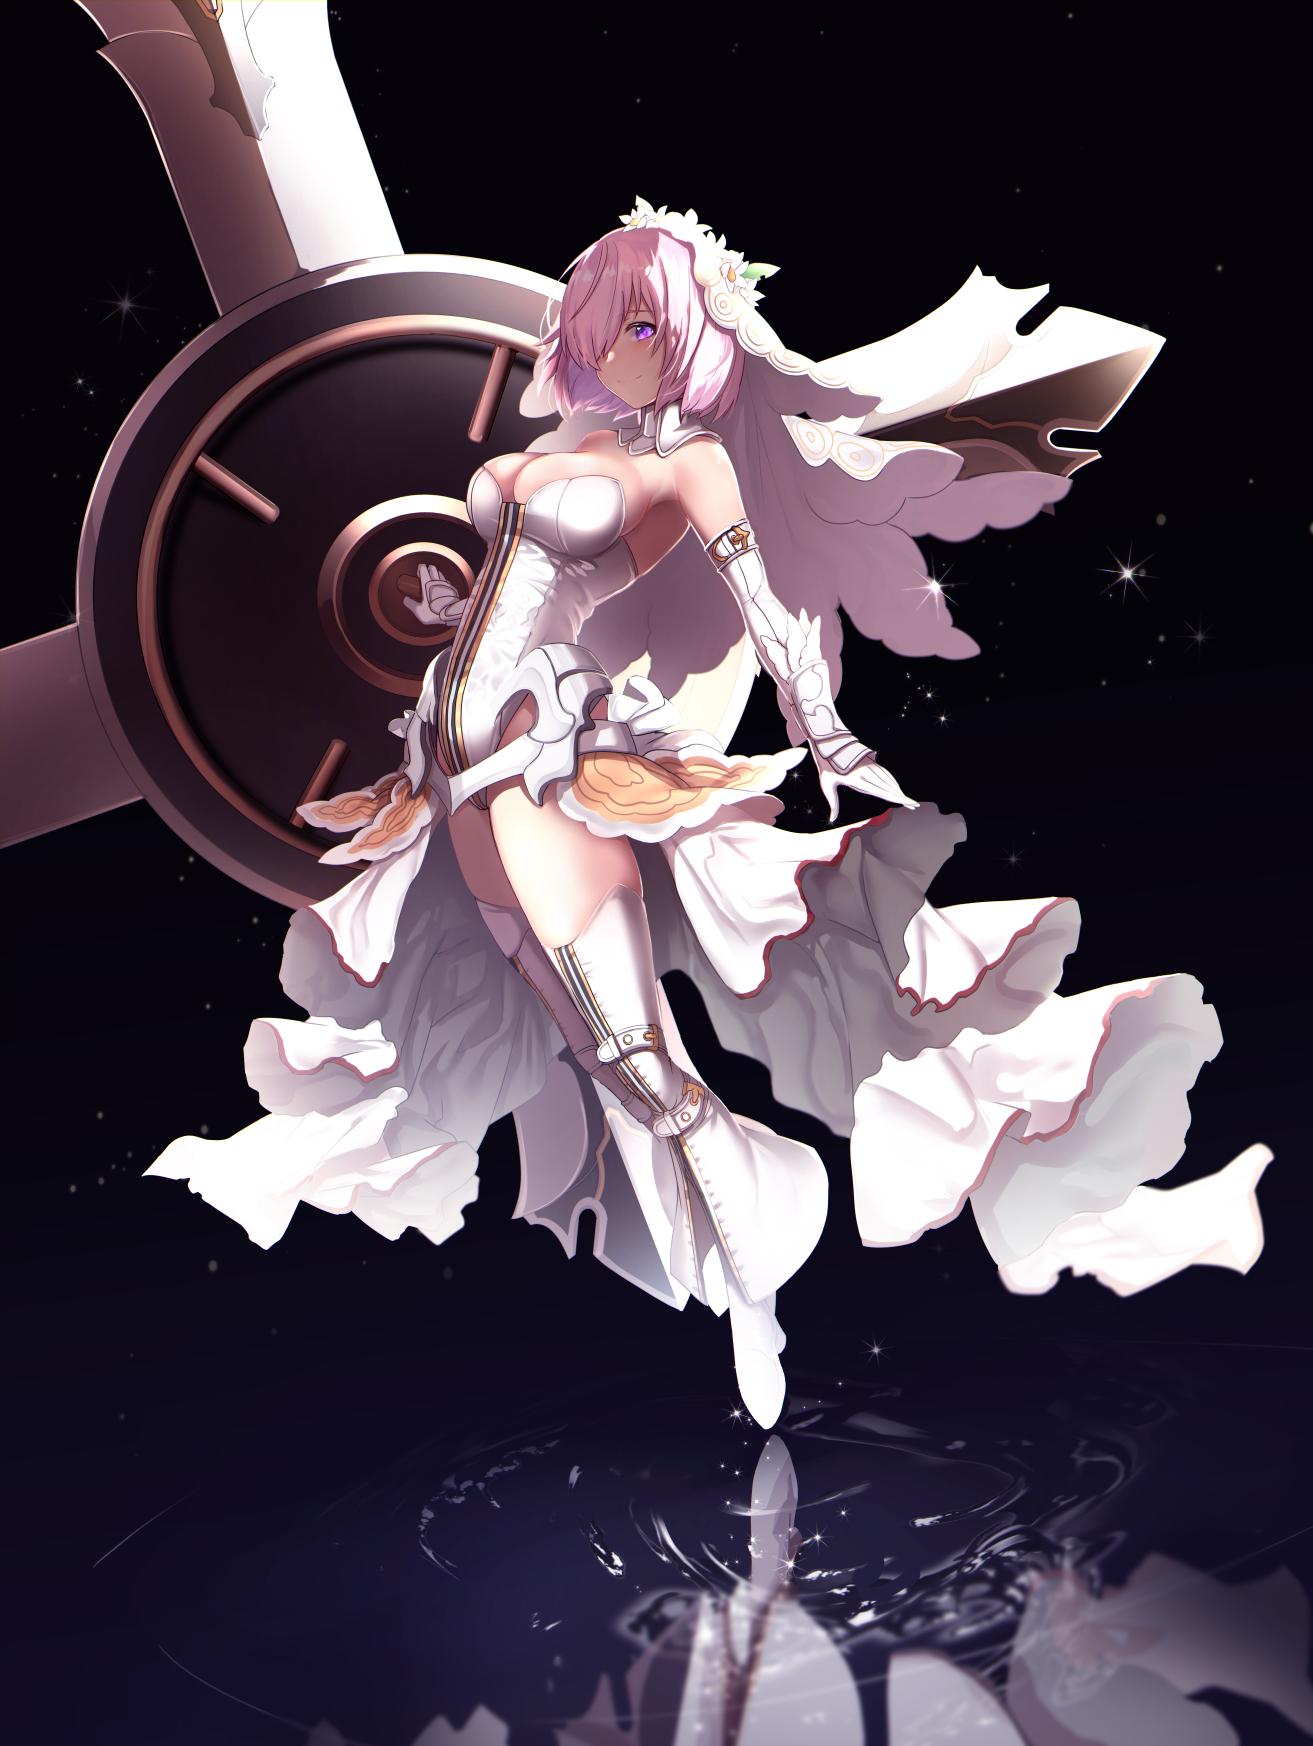 Anime 1313x1746 anime anime girls digital art artwork 2D portrait display vertical Fate Series Shielder (Fate/Grand Order) Mash Kyrielight Fate/Grand Order fantasy girl